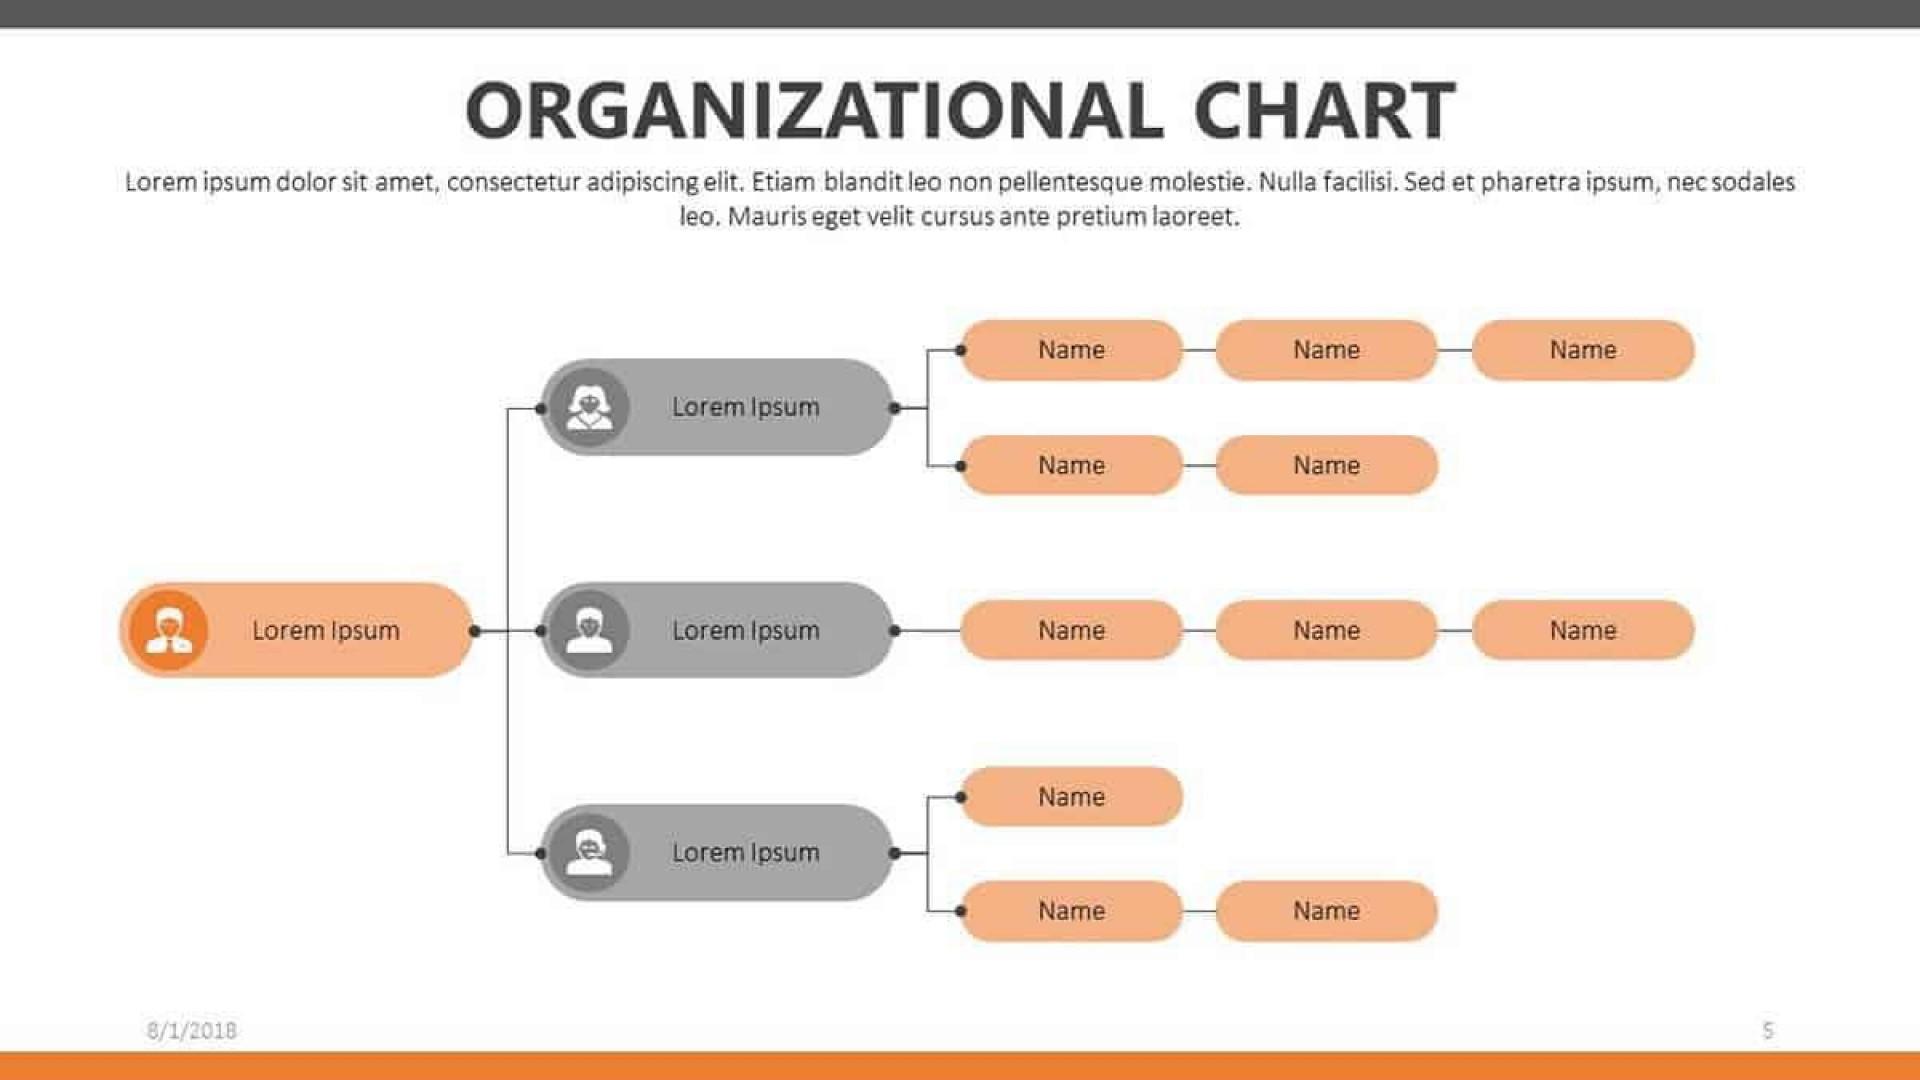 009 Stunning Org Chart Template Powerpoint Example  Organization Free Download Organizational 2010 20131920